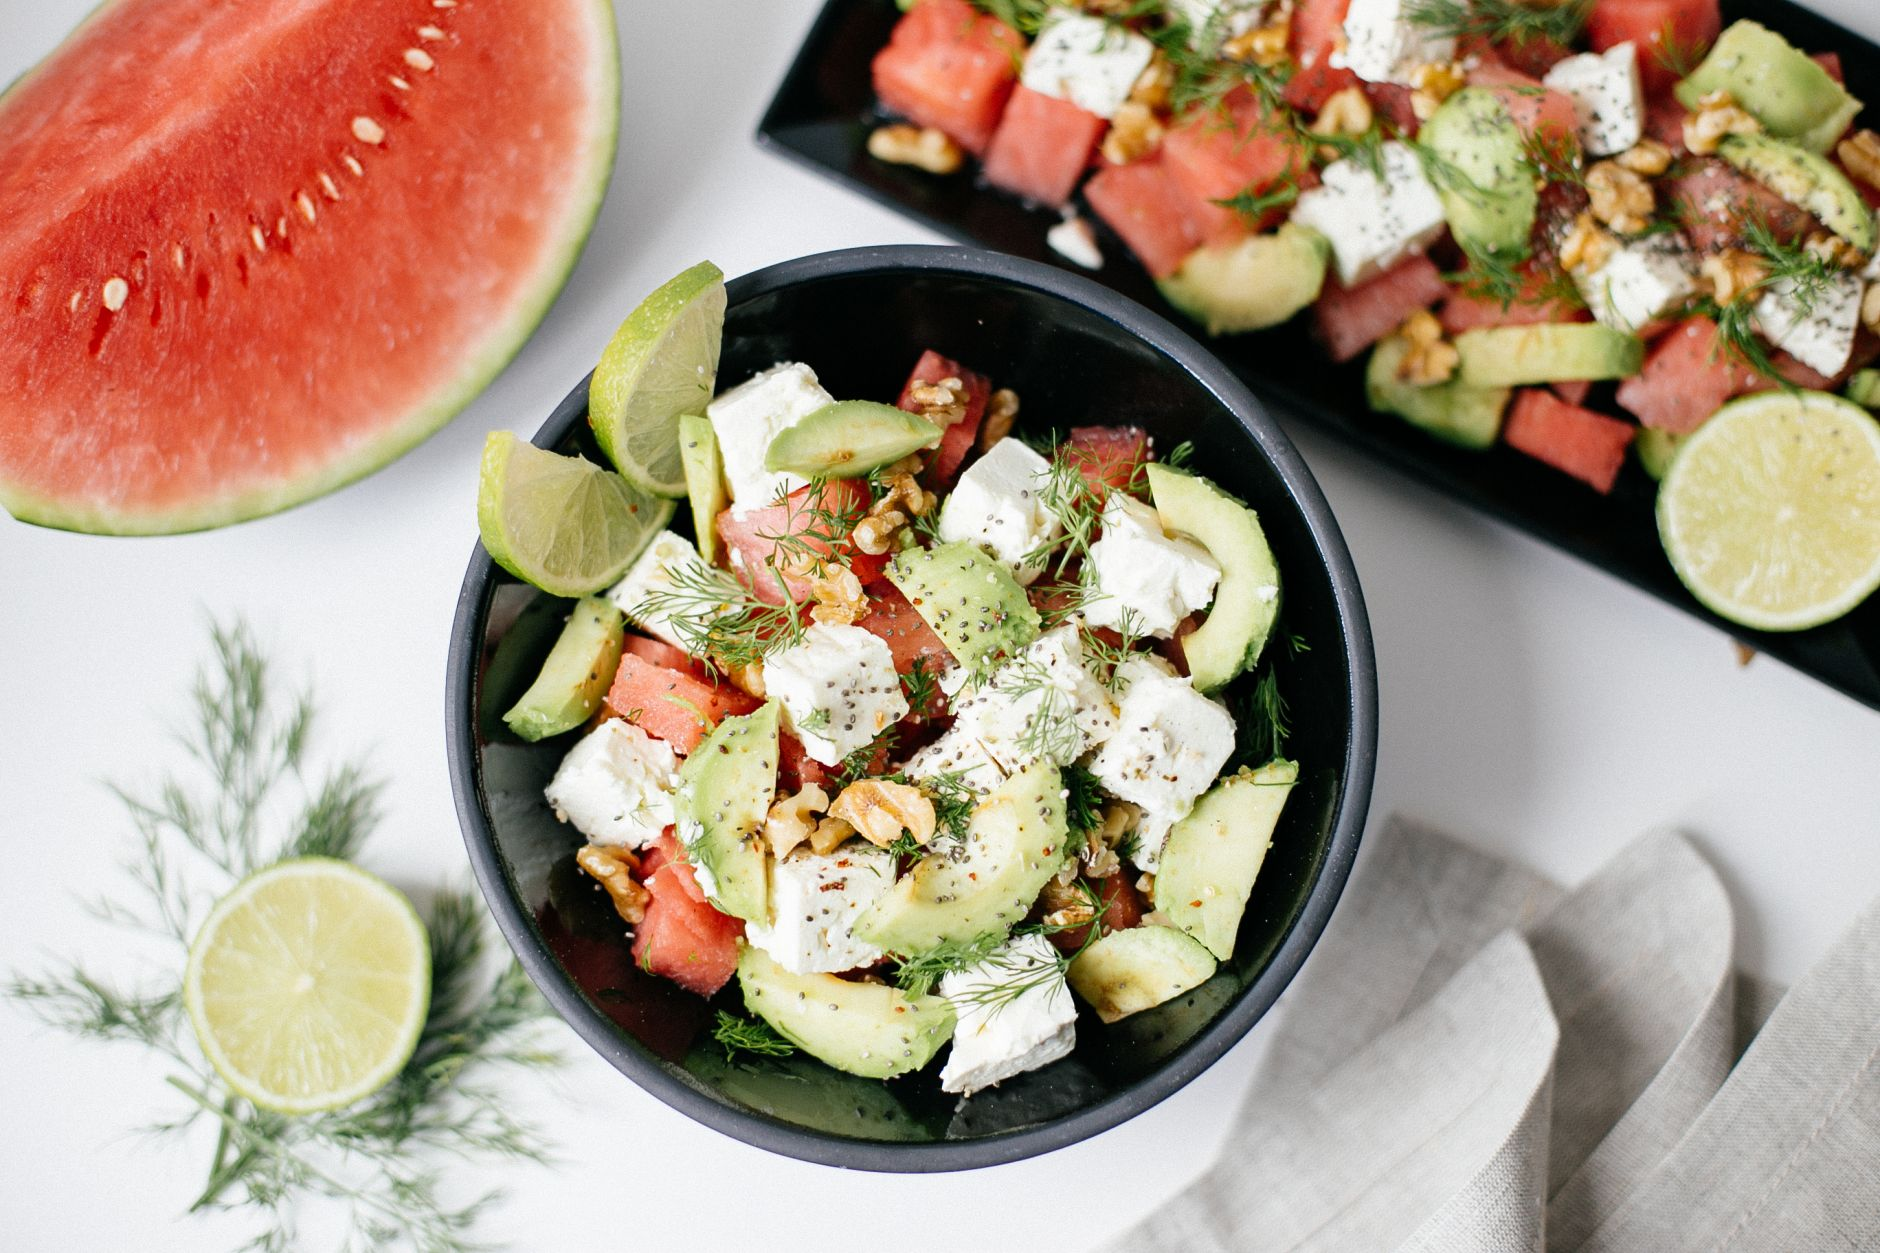 disi-couture-watermelon-avocado-summer-salad-fresh-easy-09